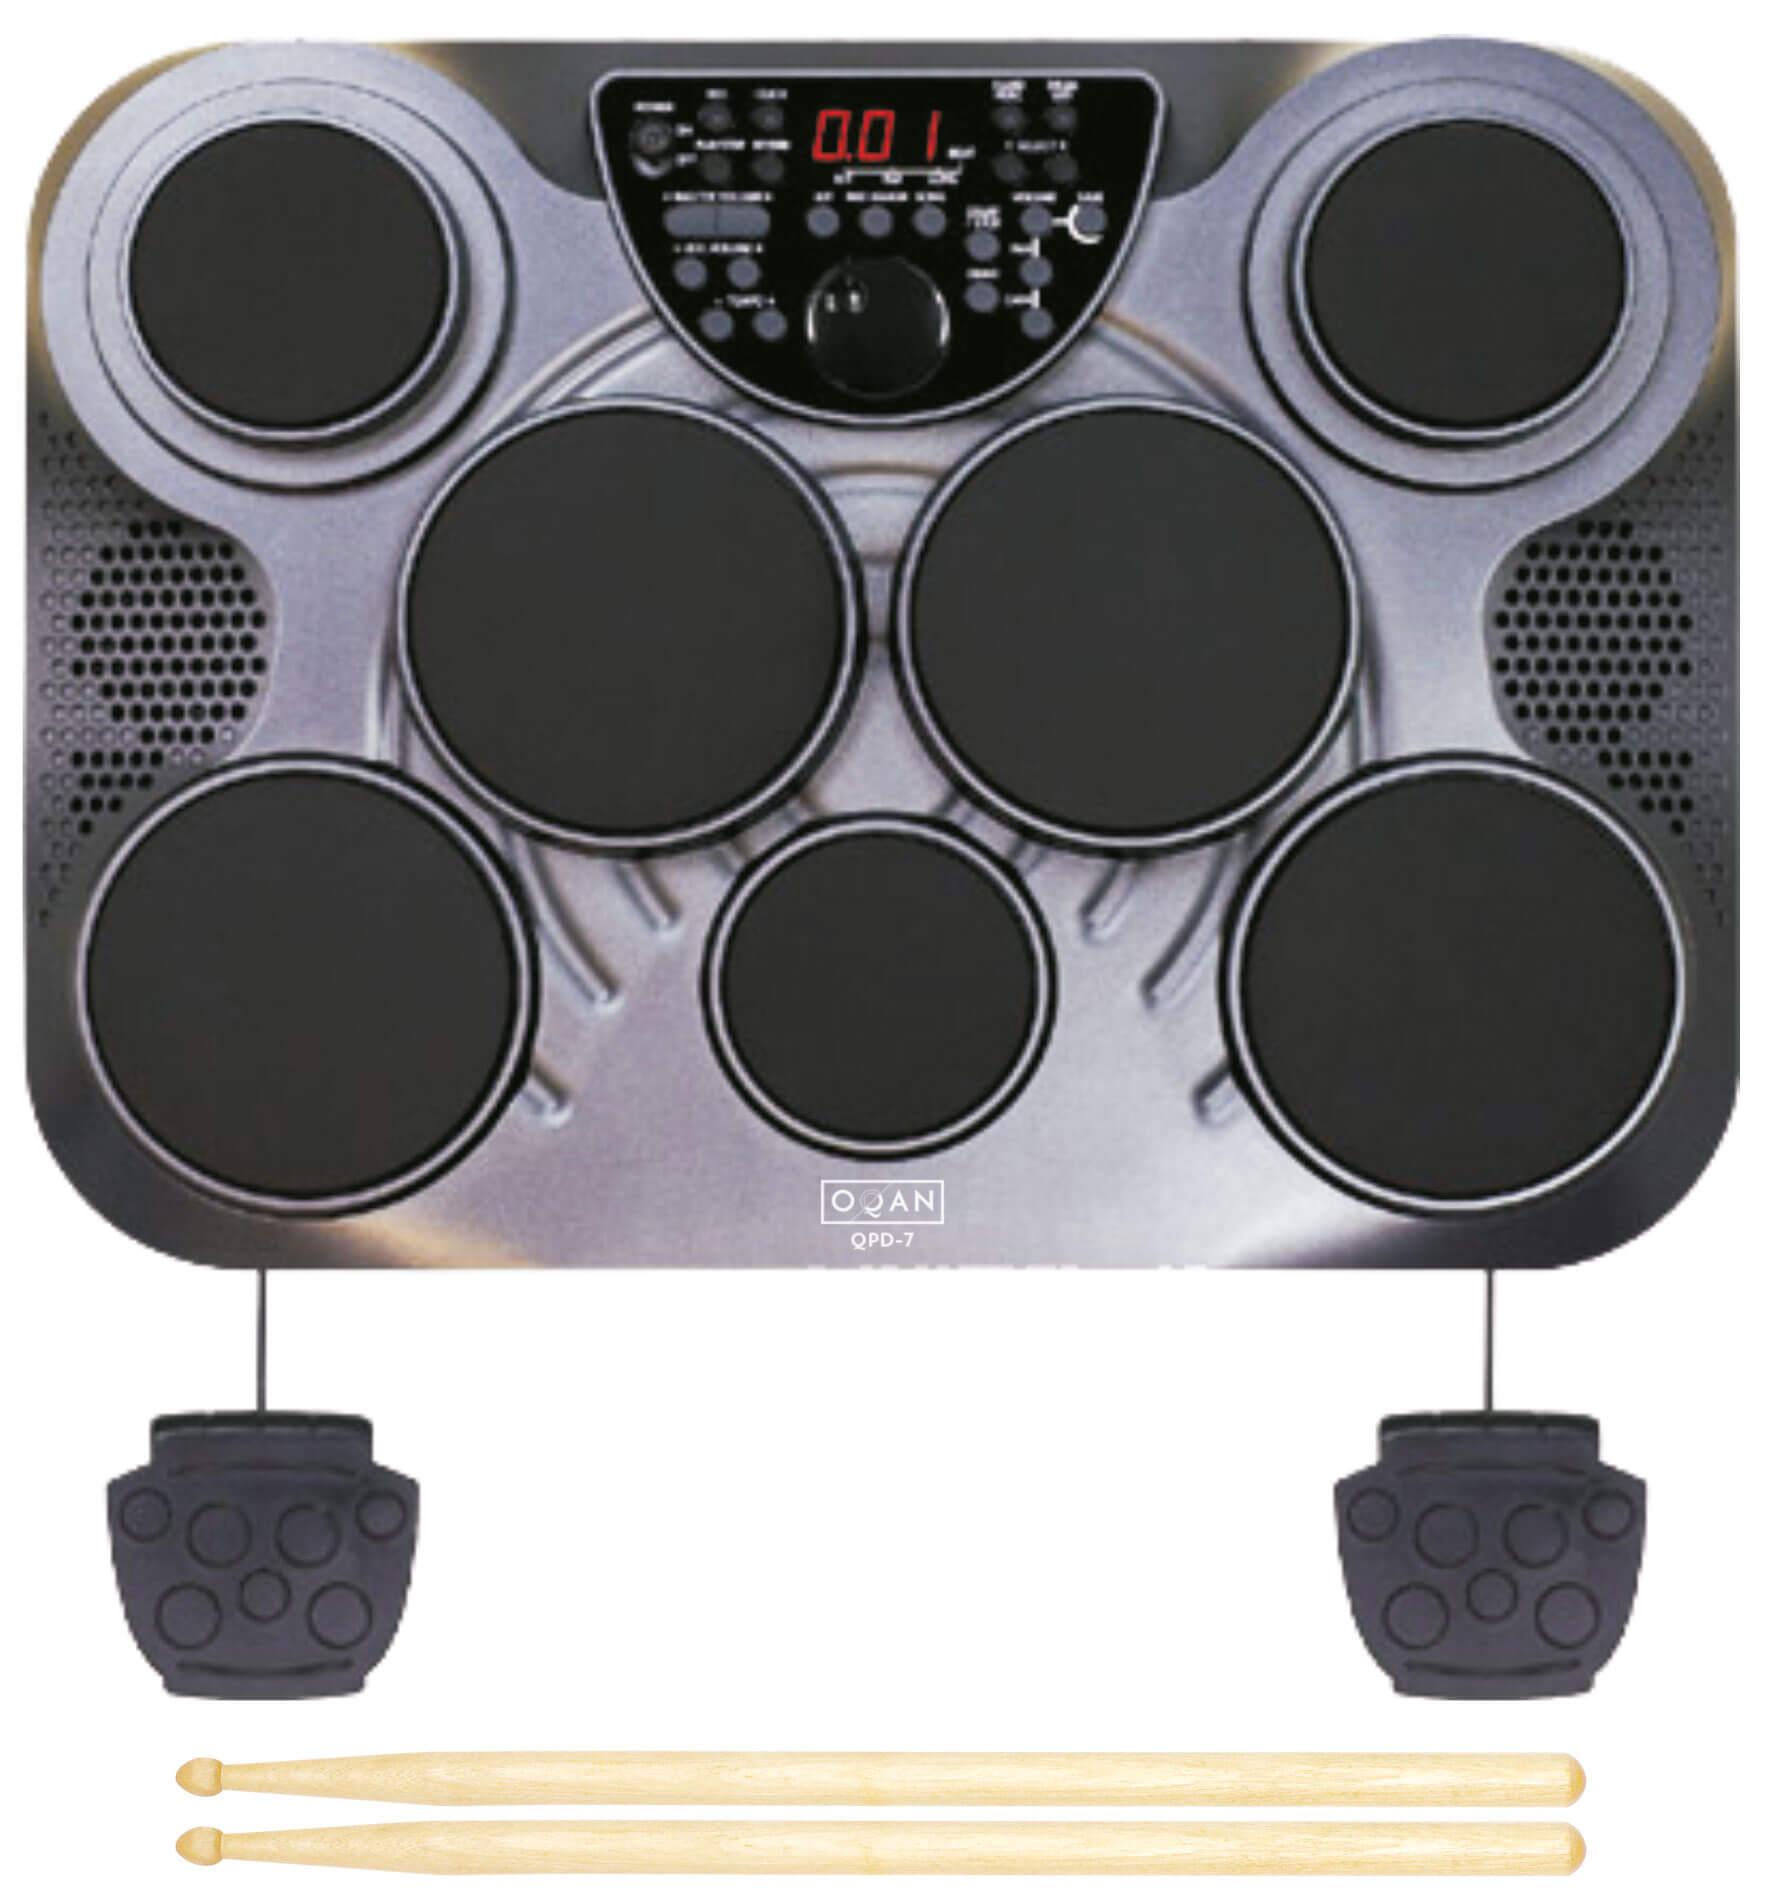 Batería Electrónica Oqan Qpd-7 Advanced Drum